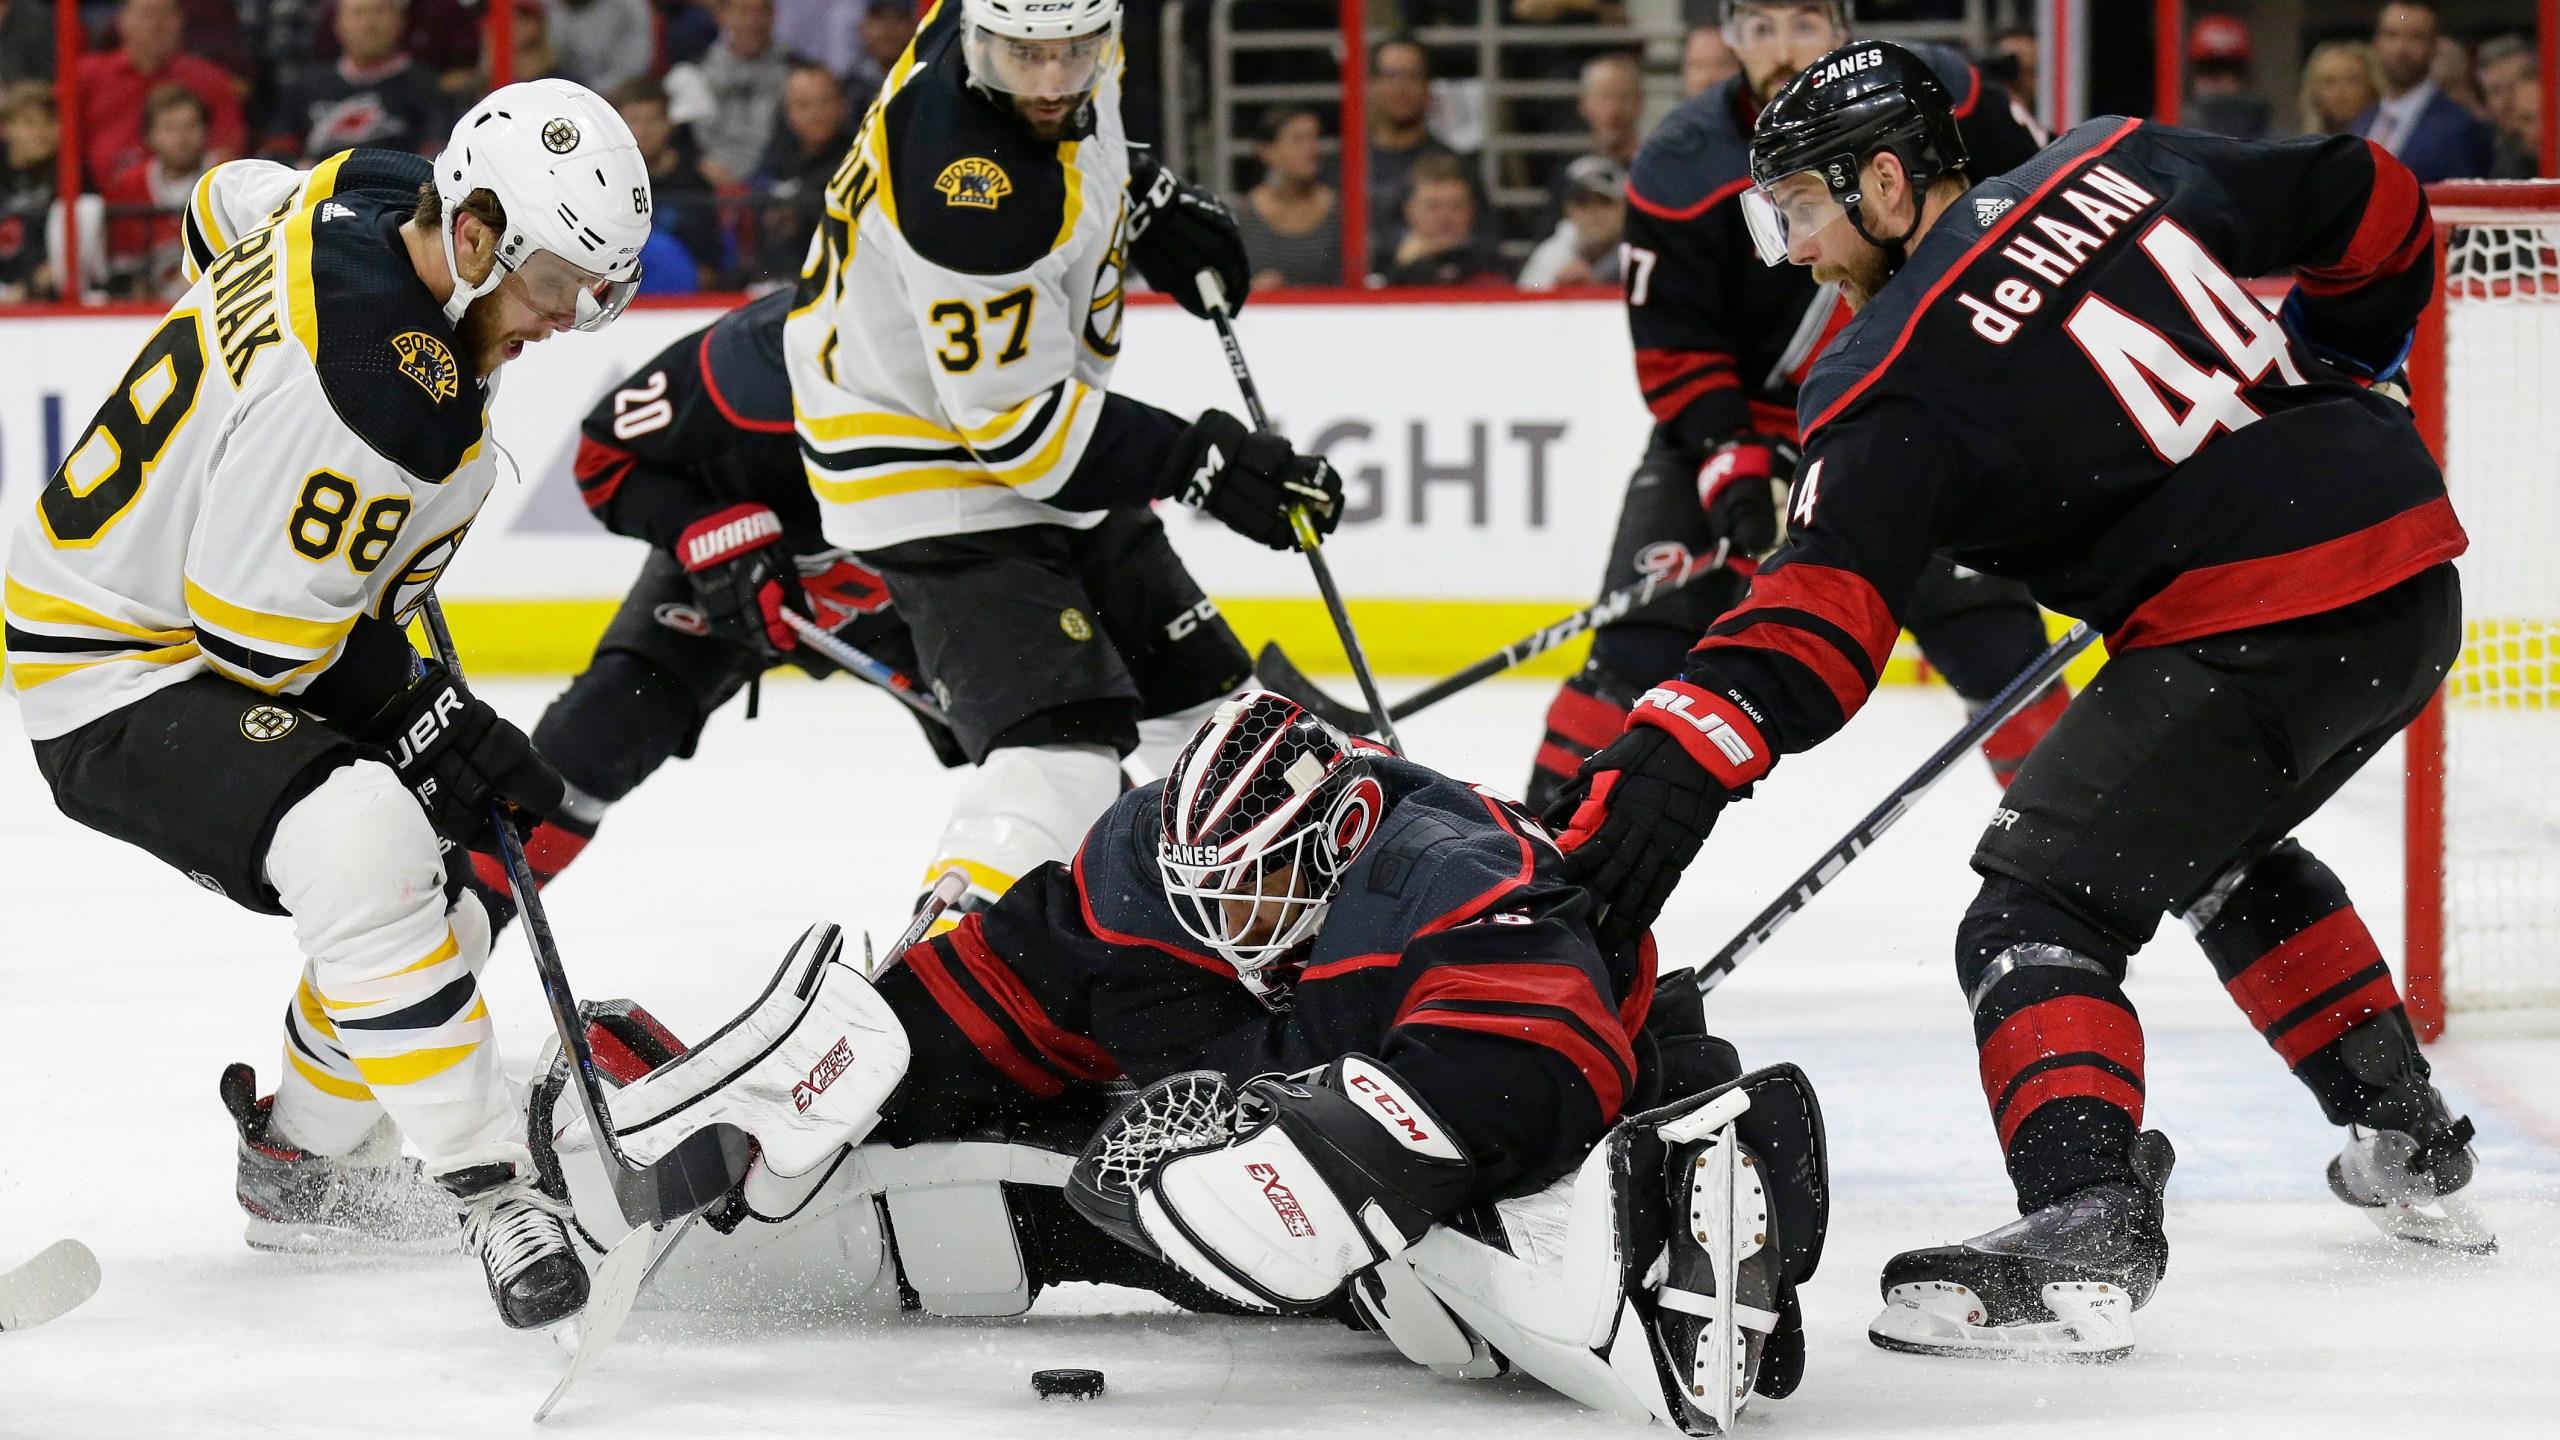 APTOPIX_Bruins_Hurricanes_Hockey_68103-159532.jpg75306158